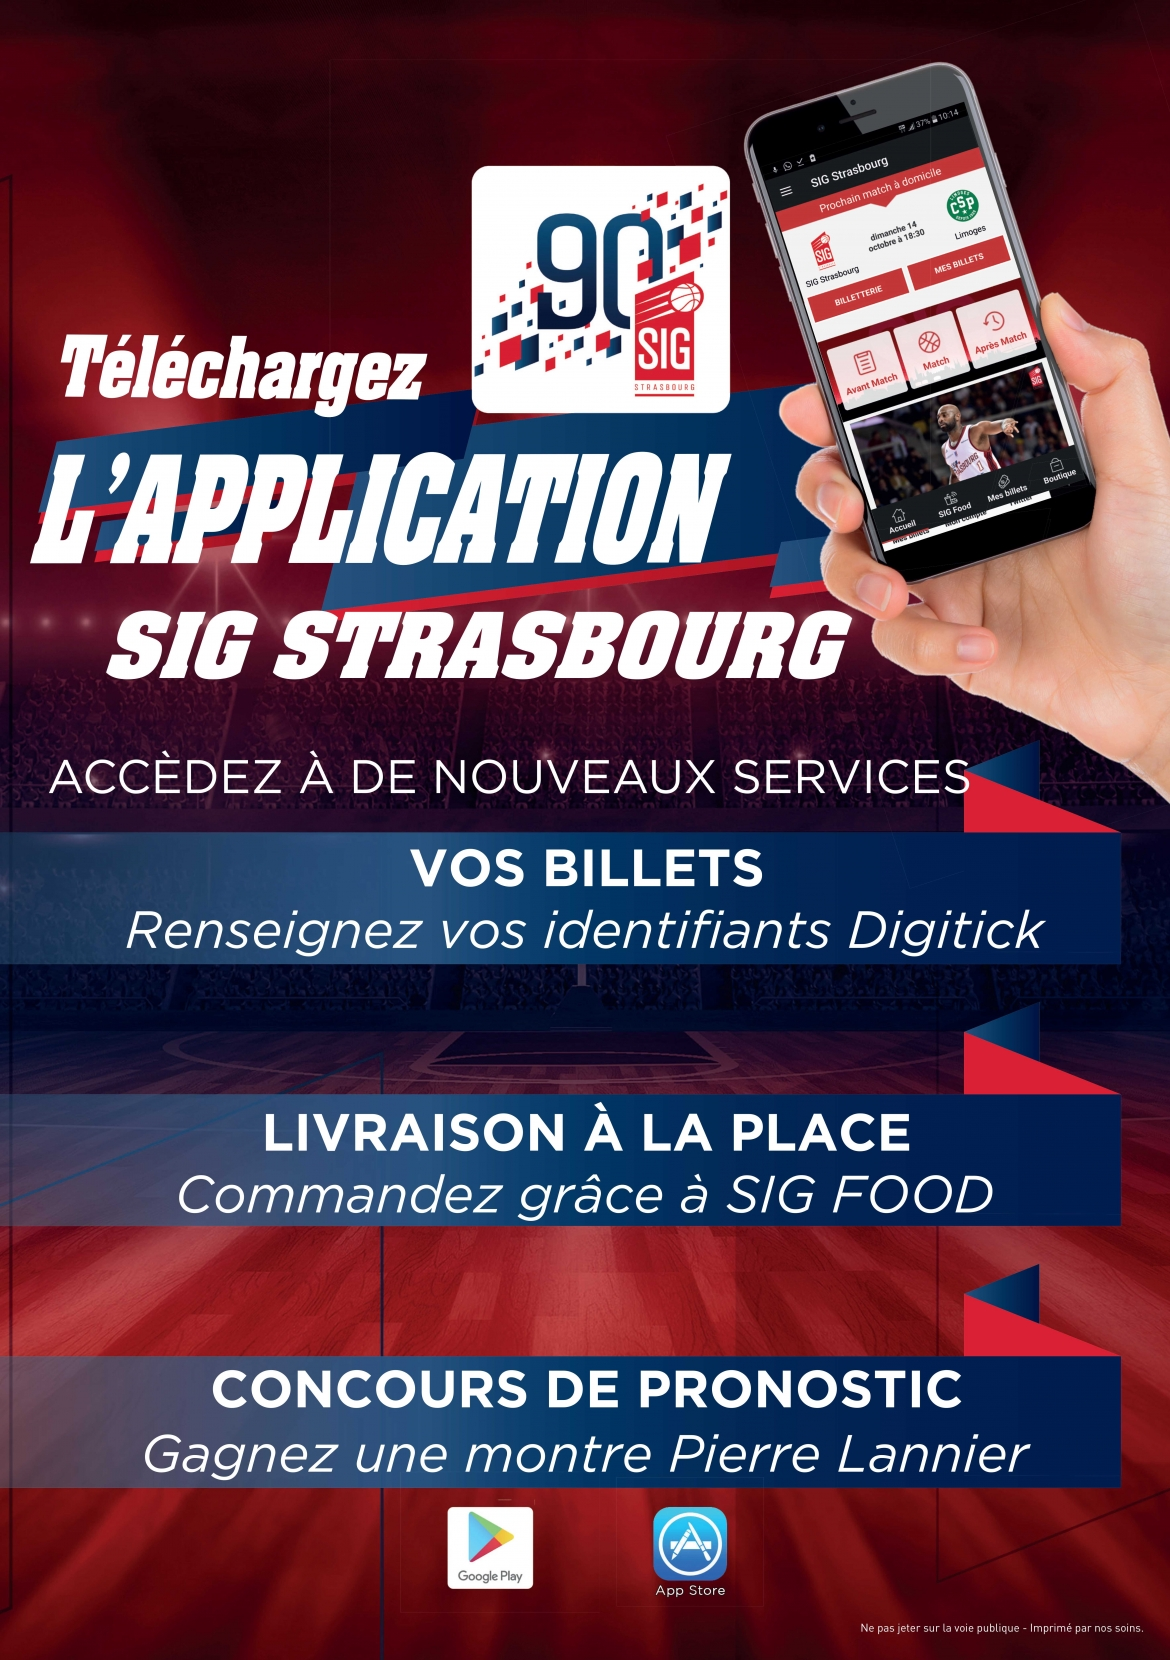 flyer_appli_sig_strasbourg_hfa_bat.jpg